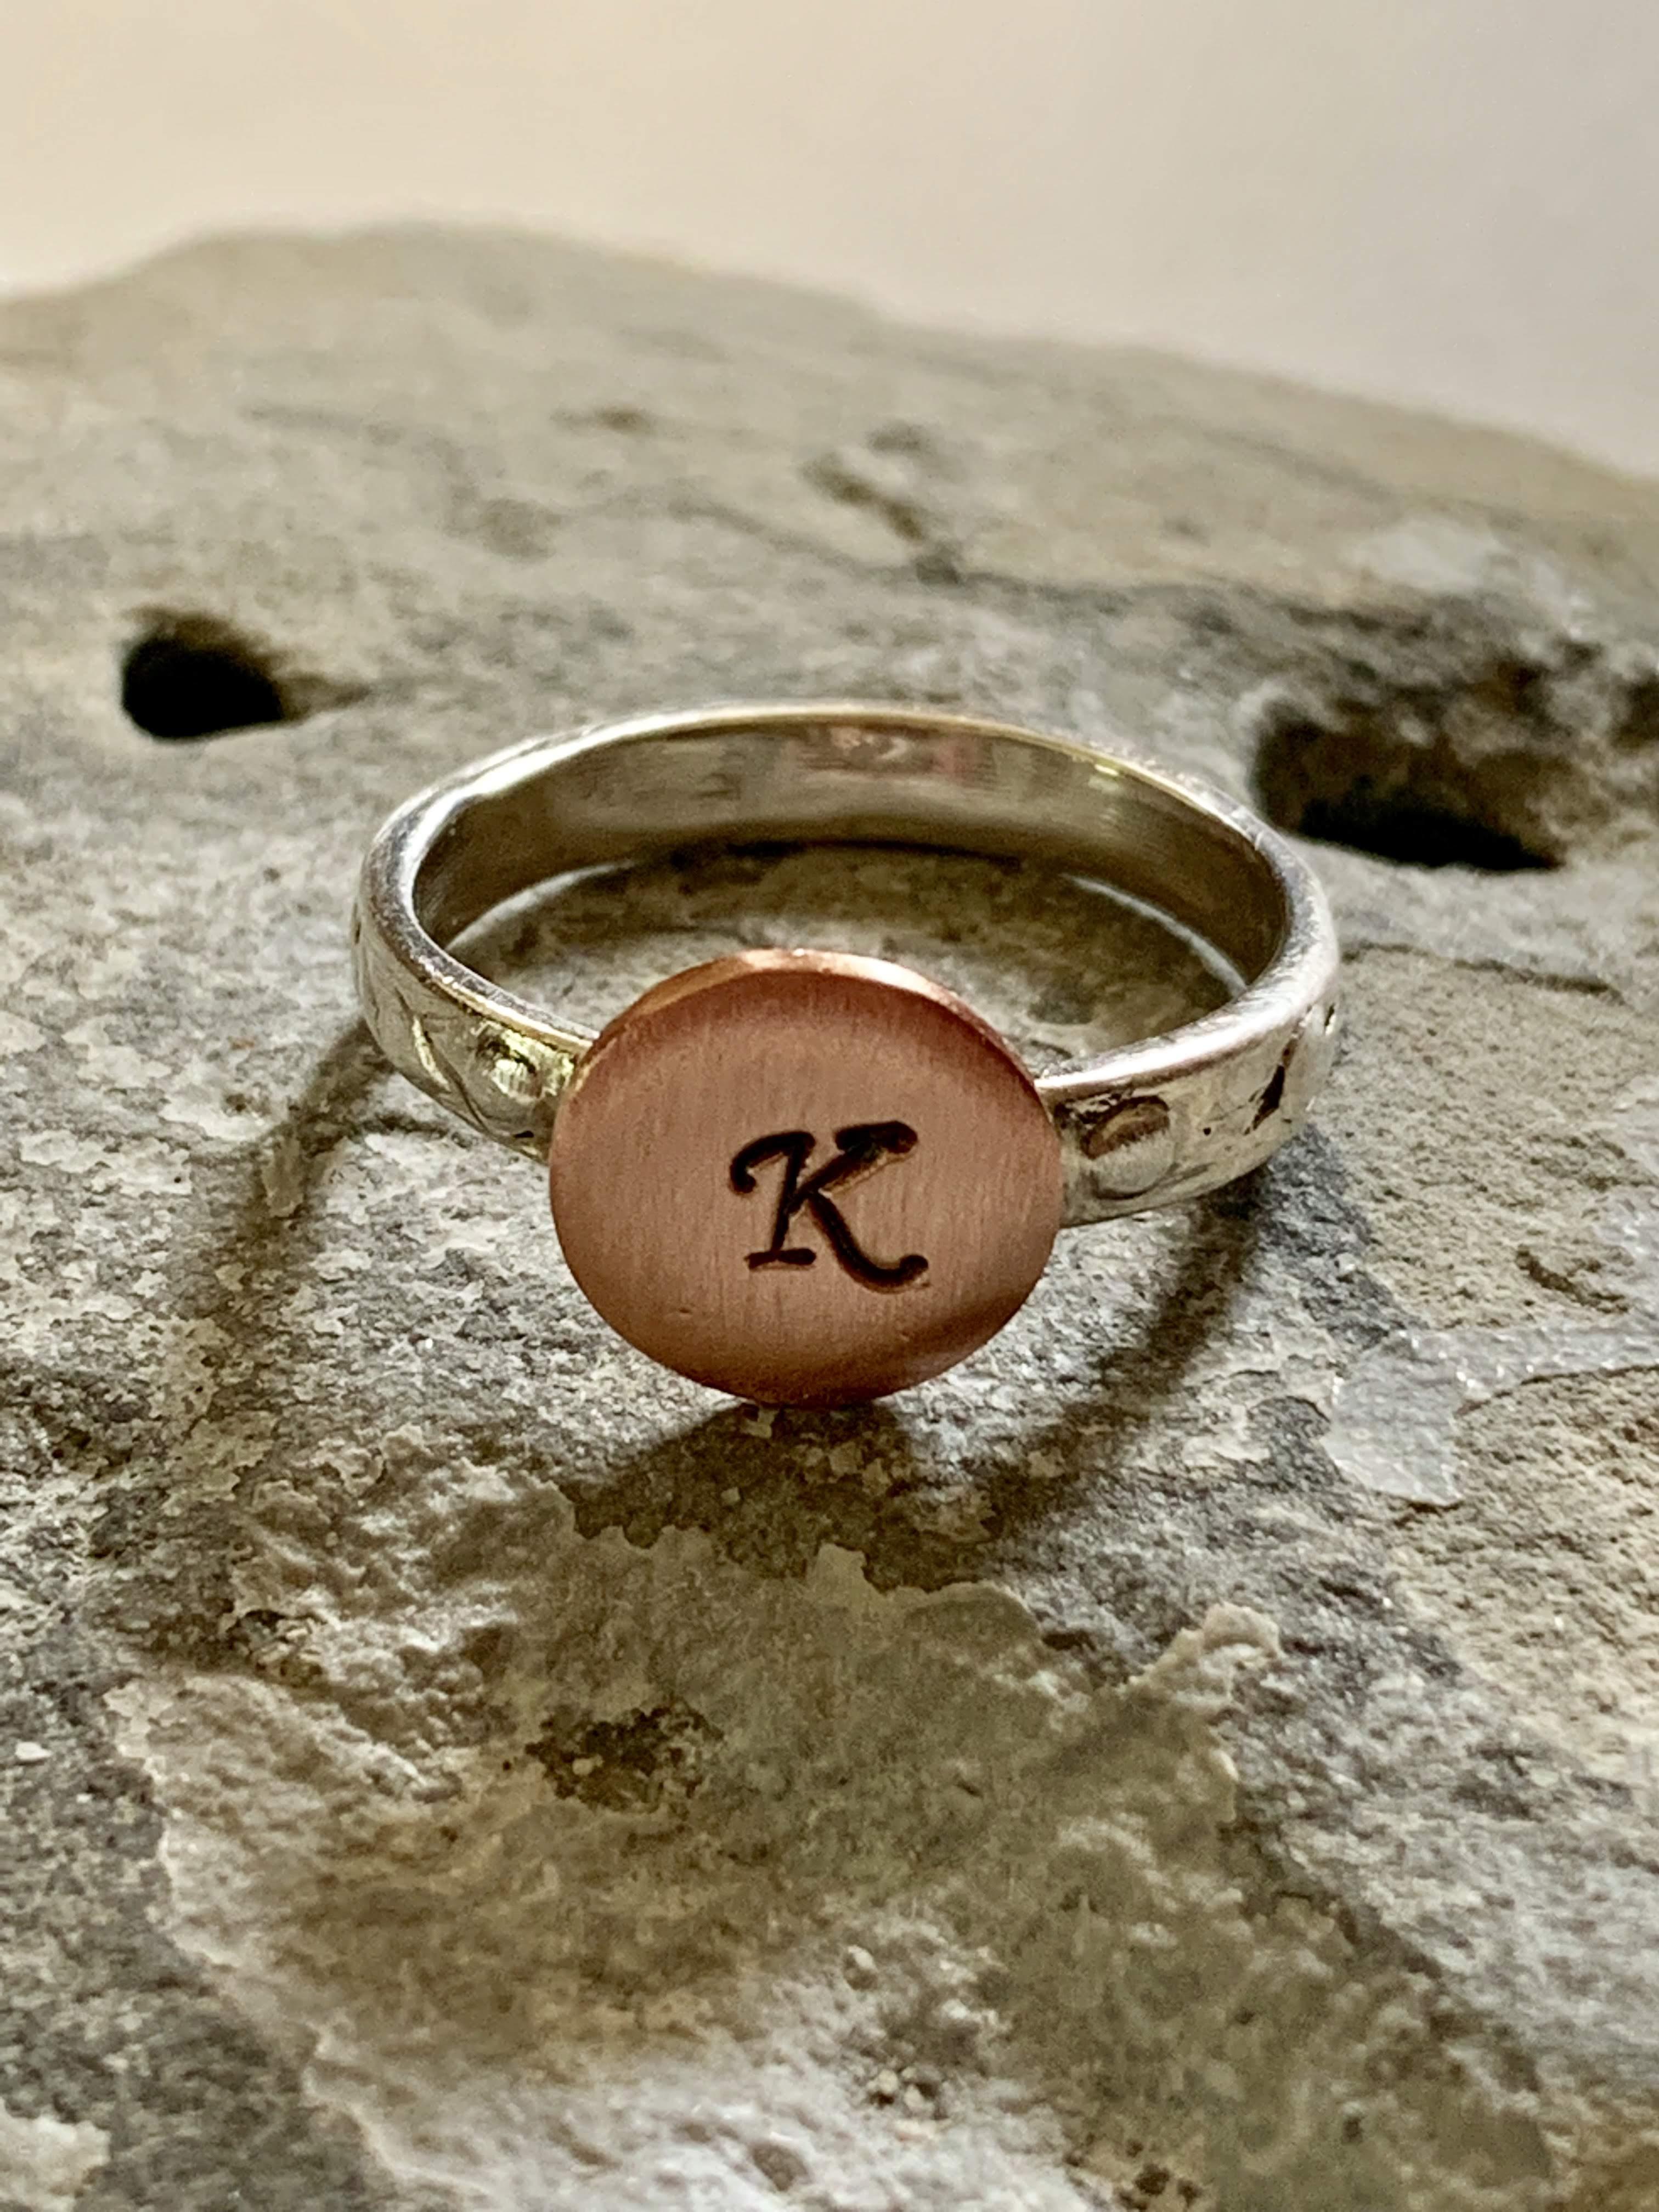 Kimberly_Carman_Jewelry_Designs_Rings_18